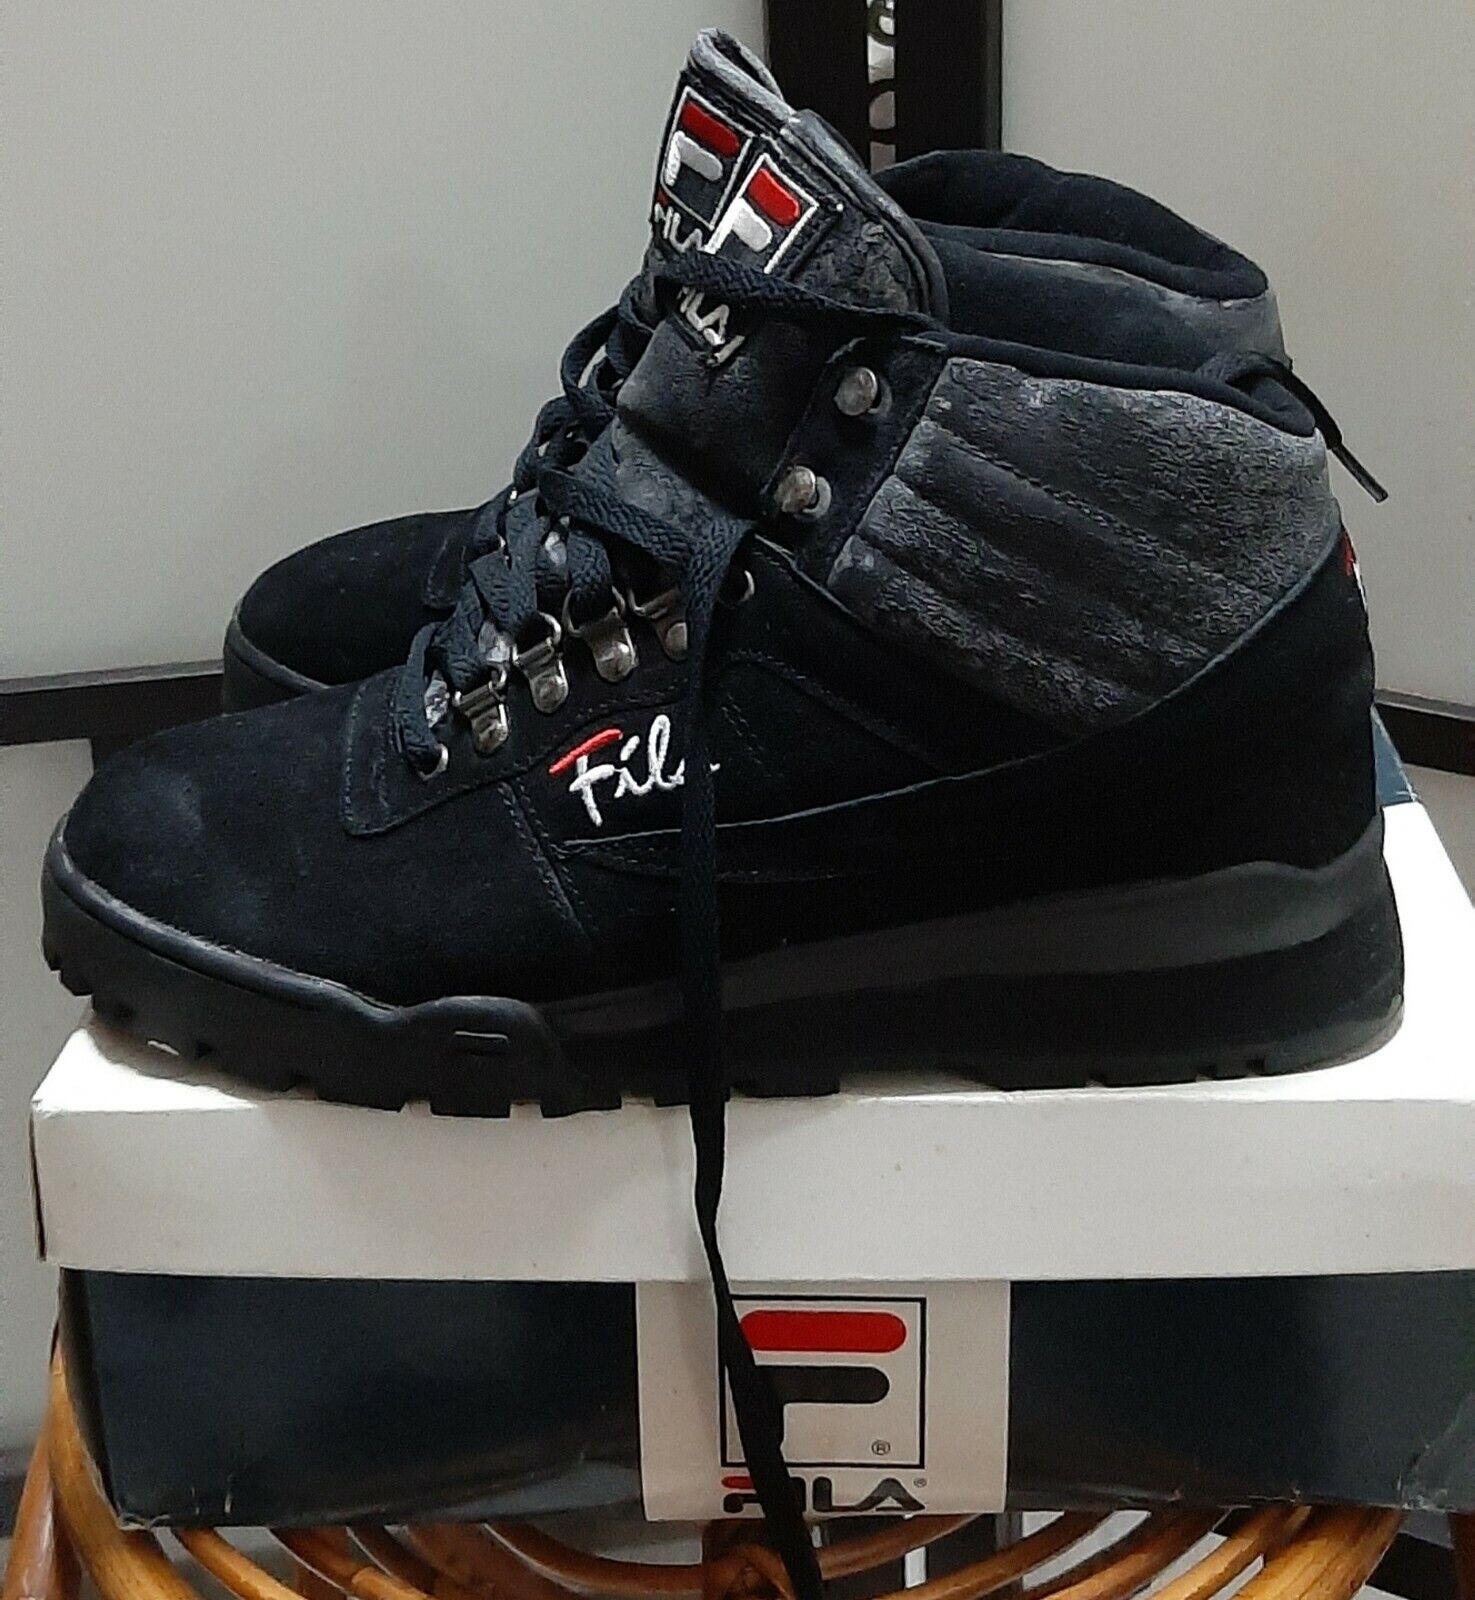 90s fila fitness hiker original shoes sneakers deadstock vintage retro